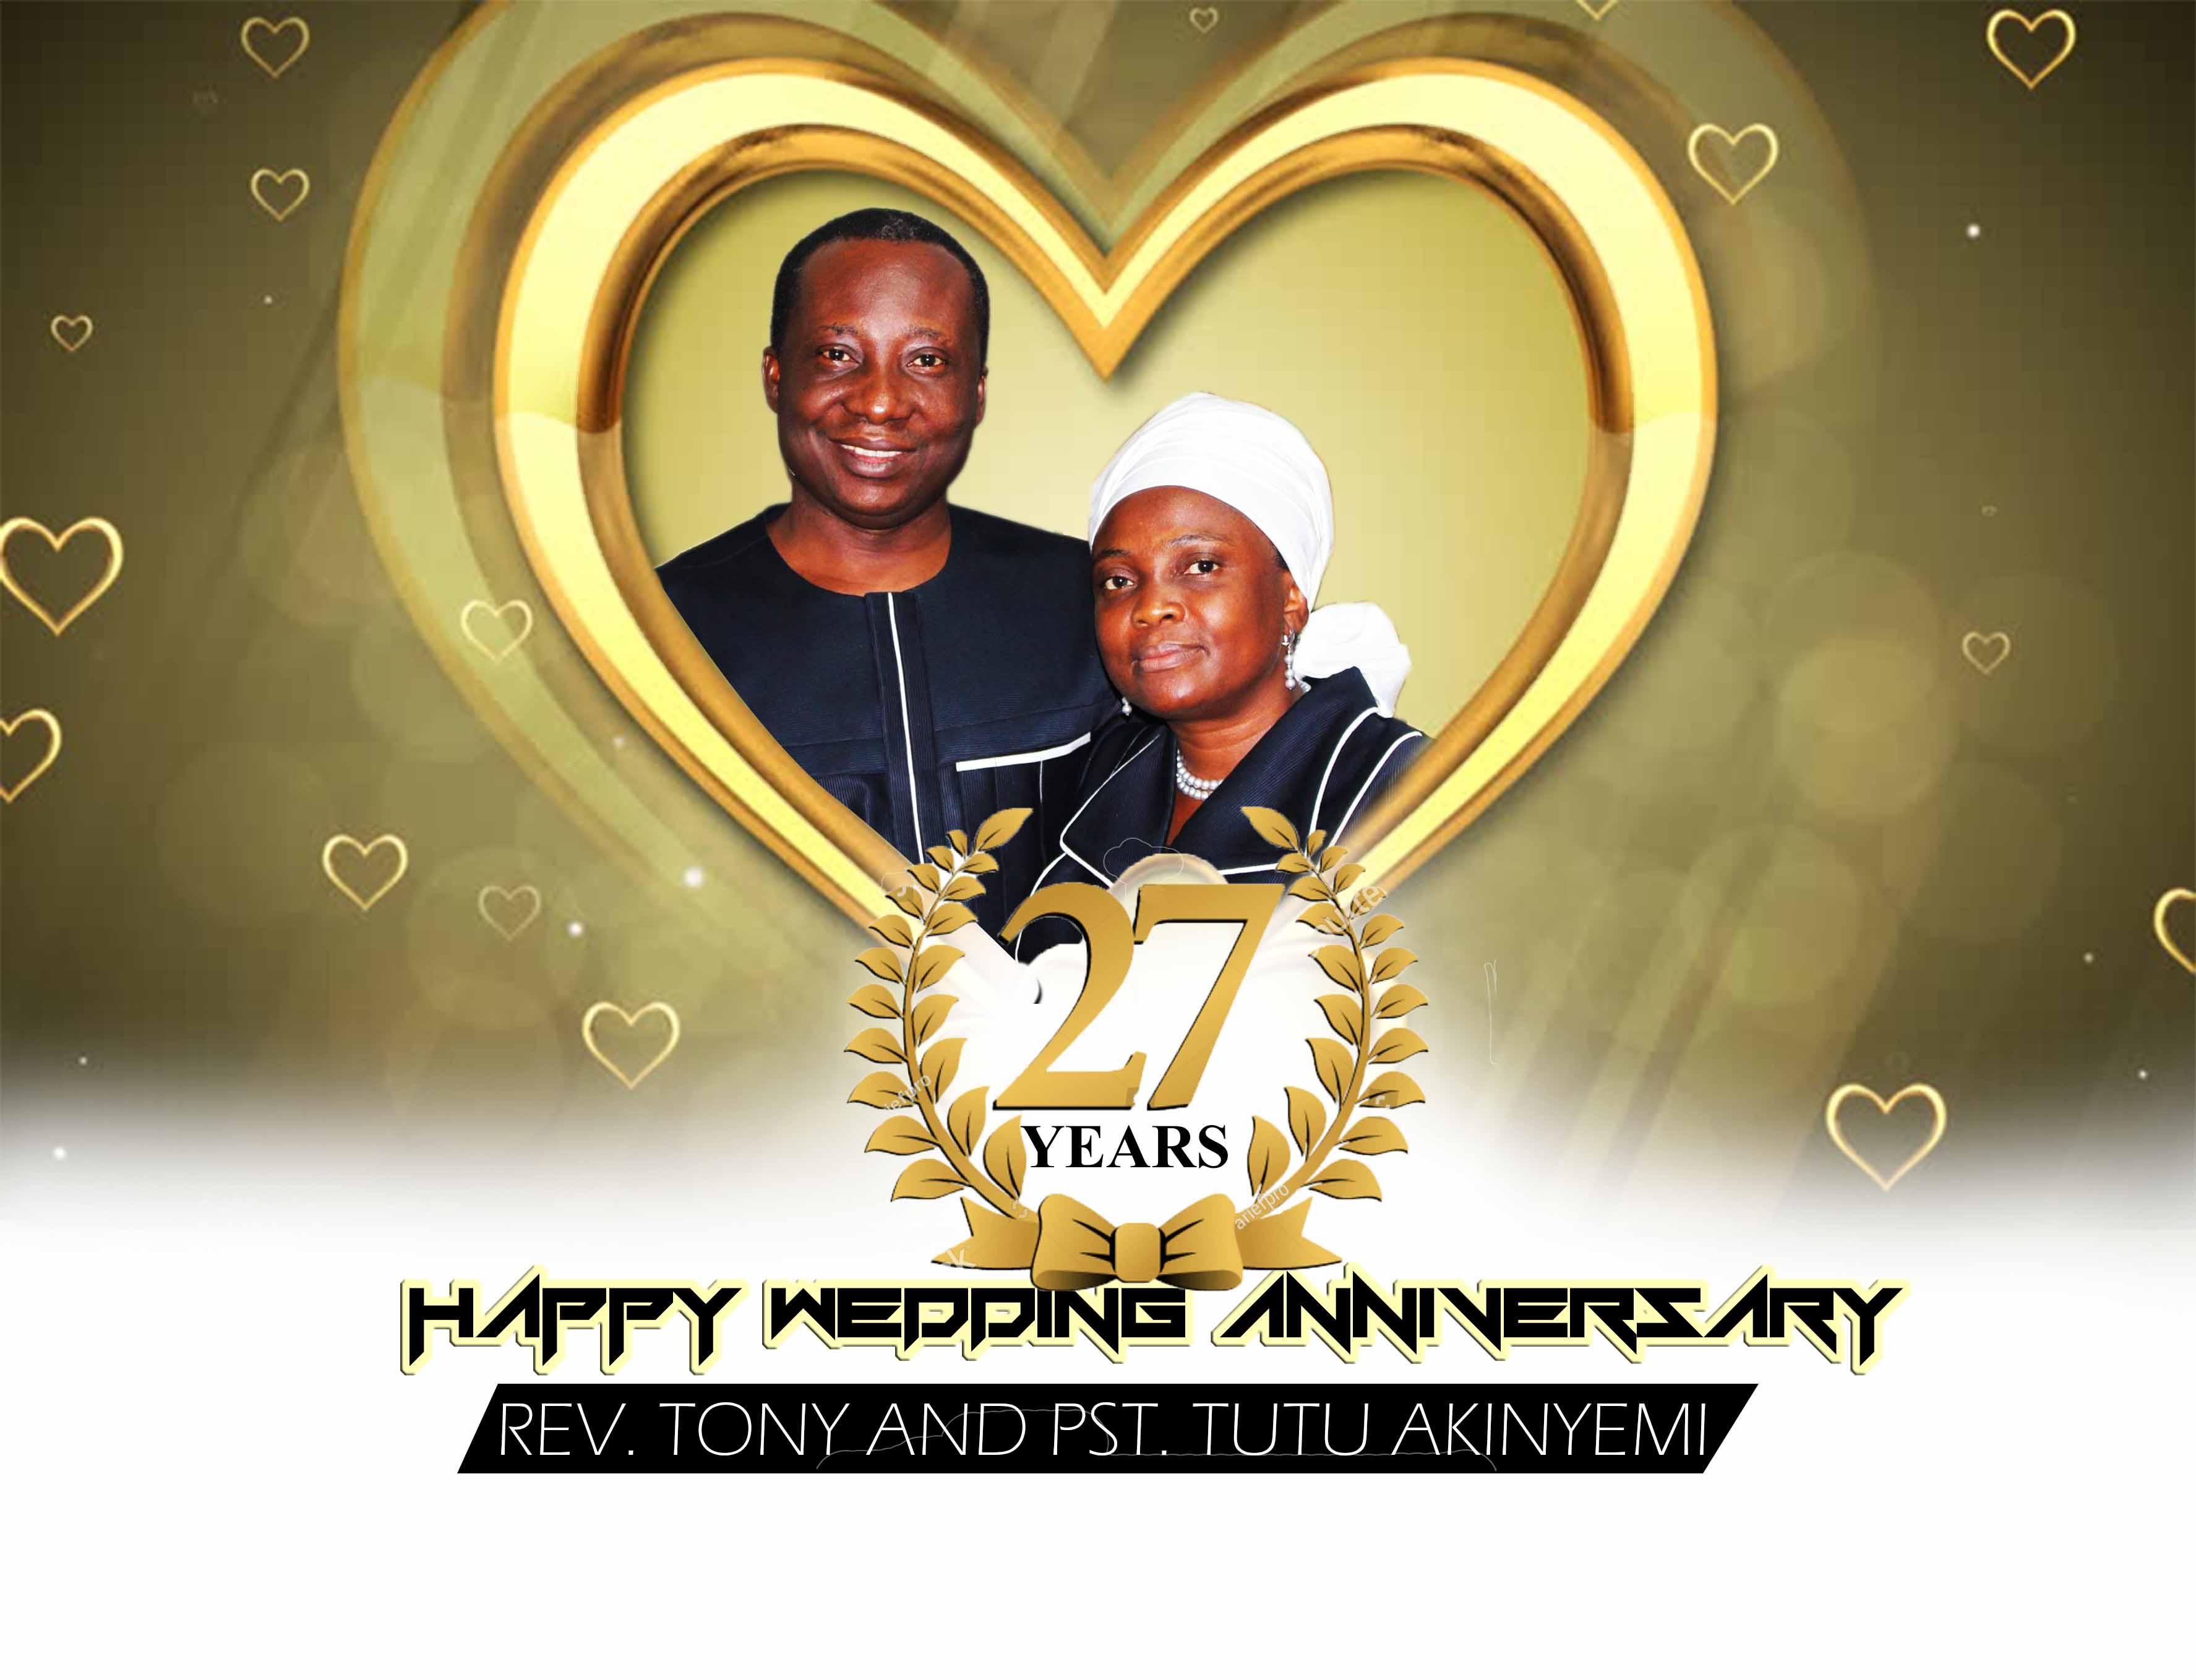 Happy 27th Anniversary to Rev Tony & Pst Tutu Akinyemi